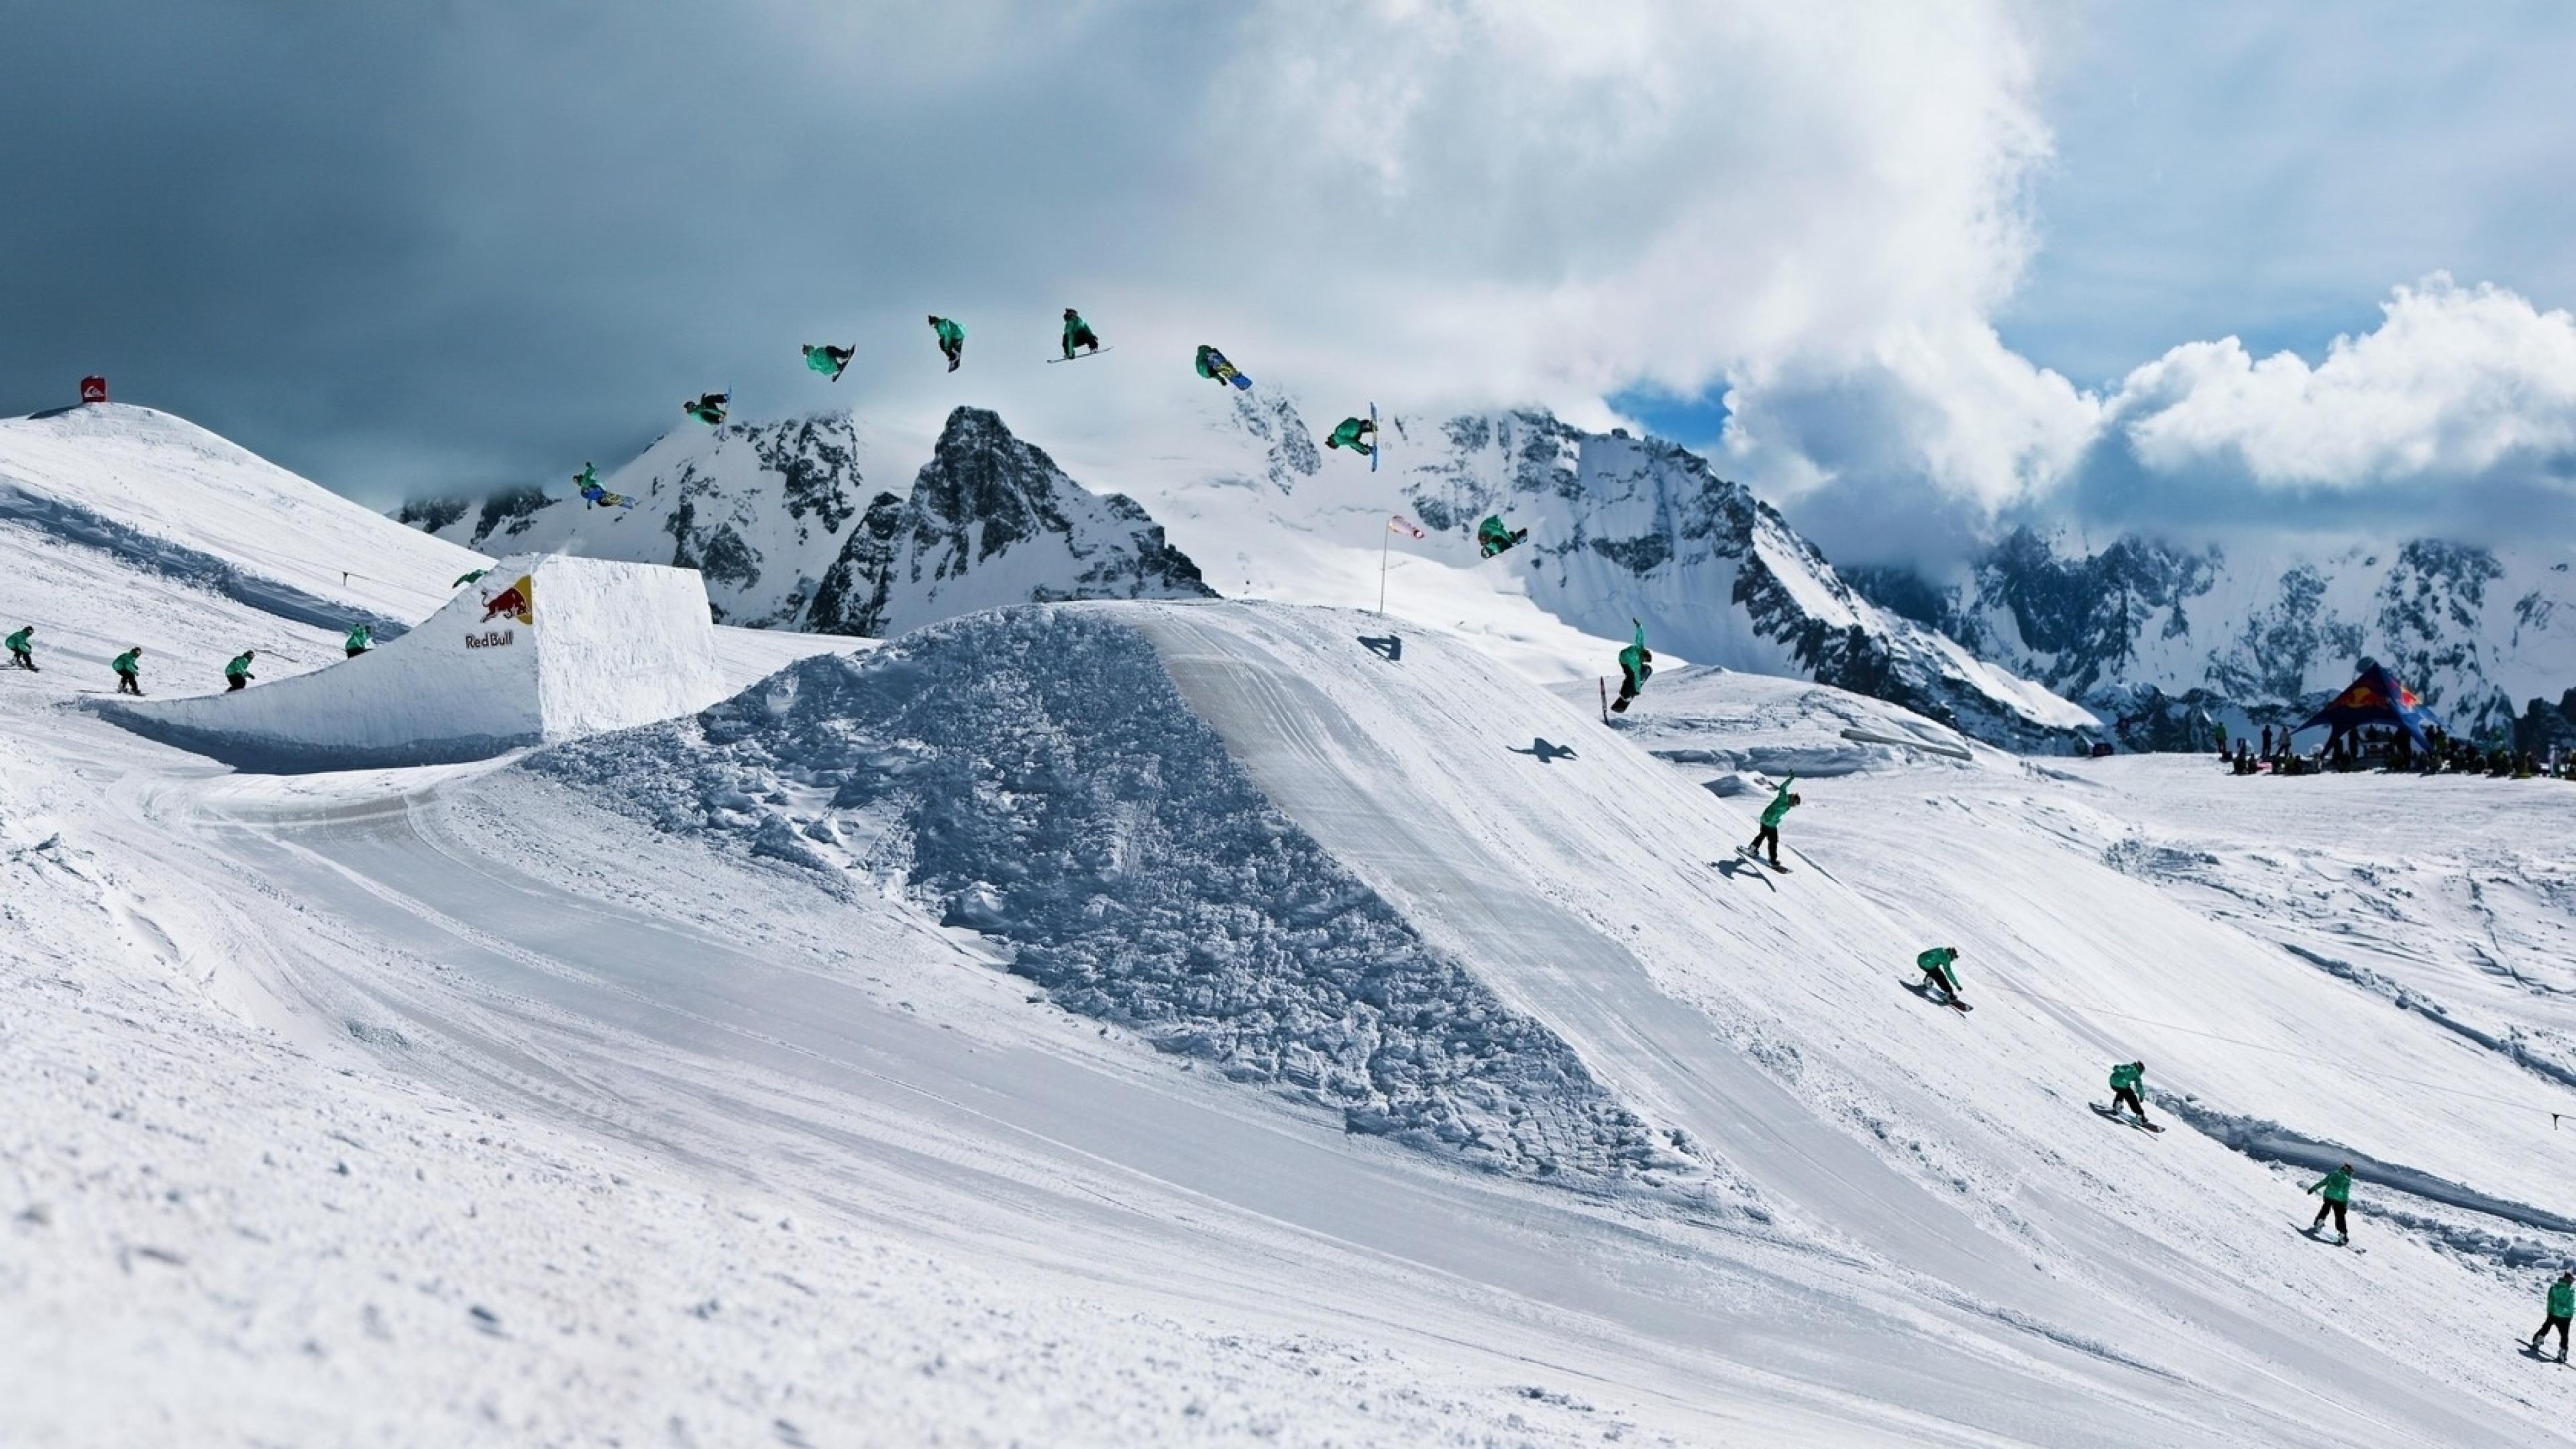 High-profile ski multiple exposure wallpaper